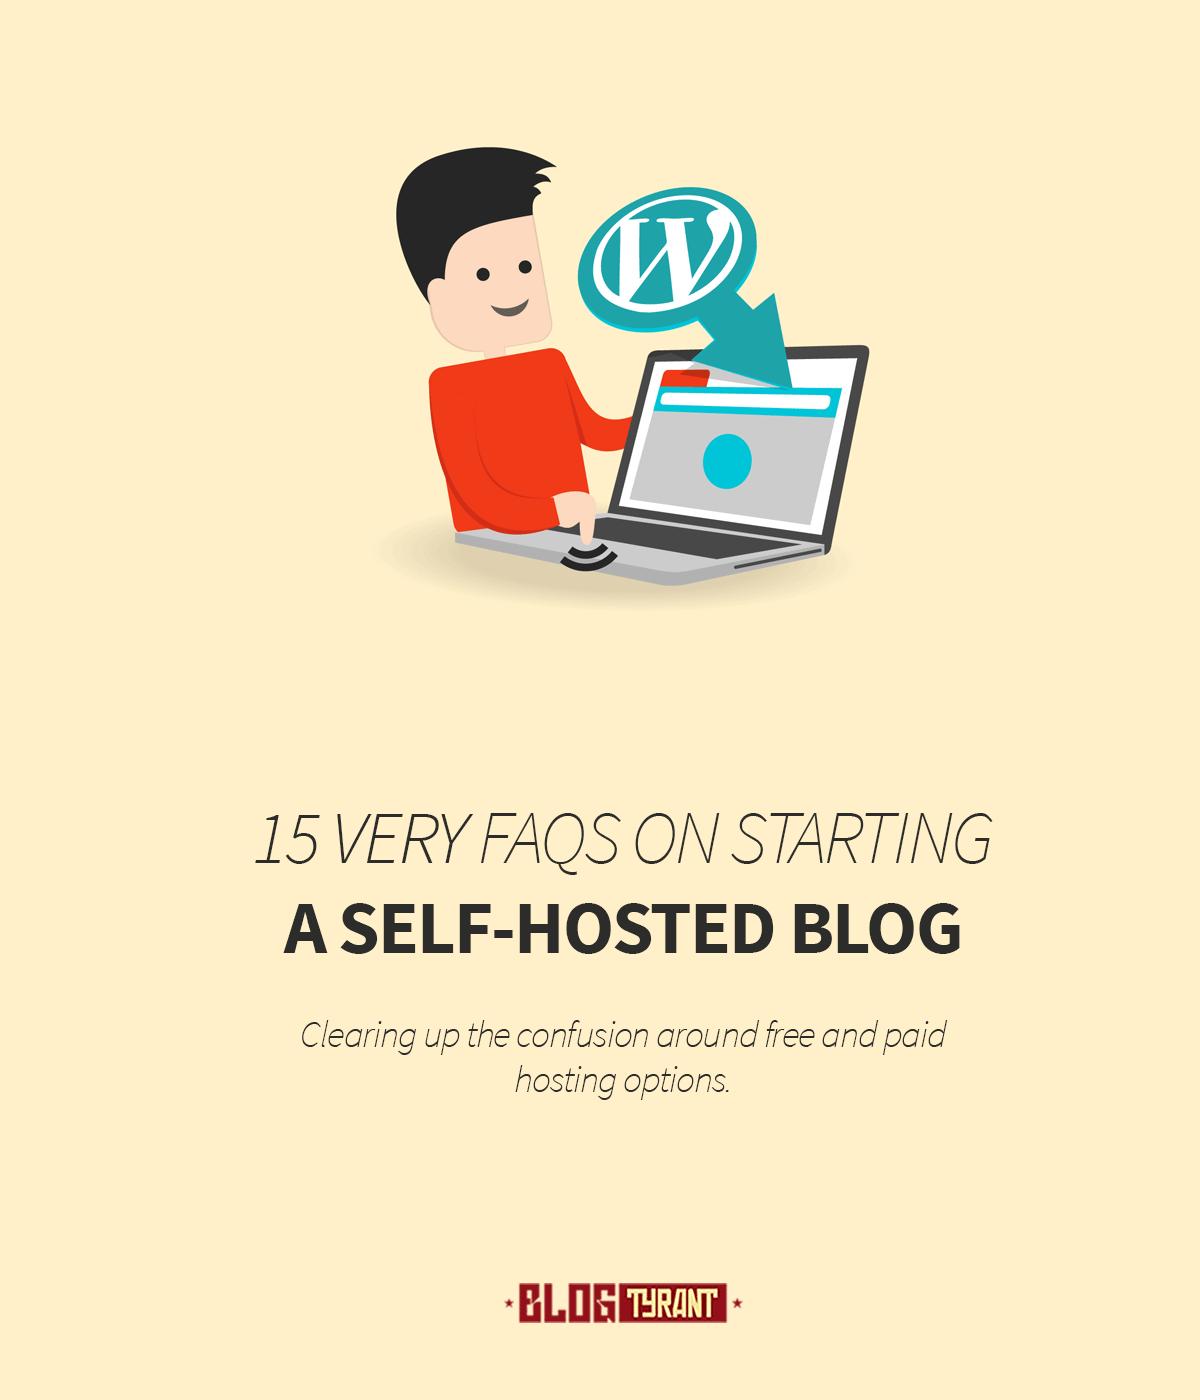 self hosted blog faqs